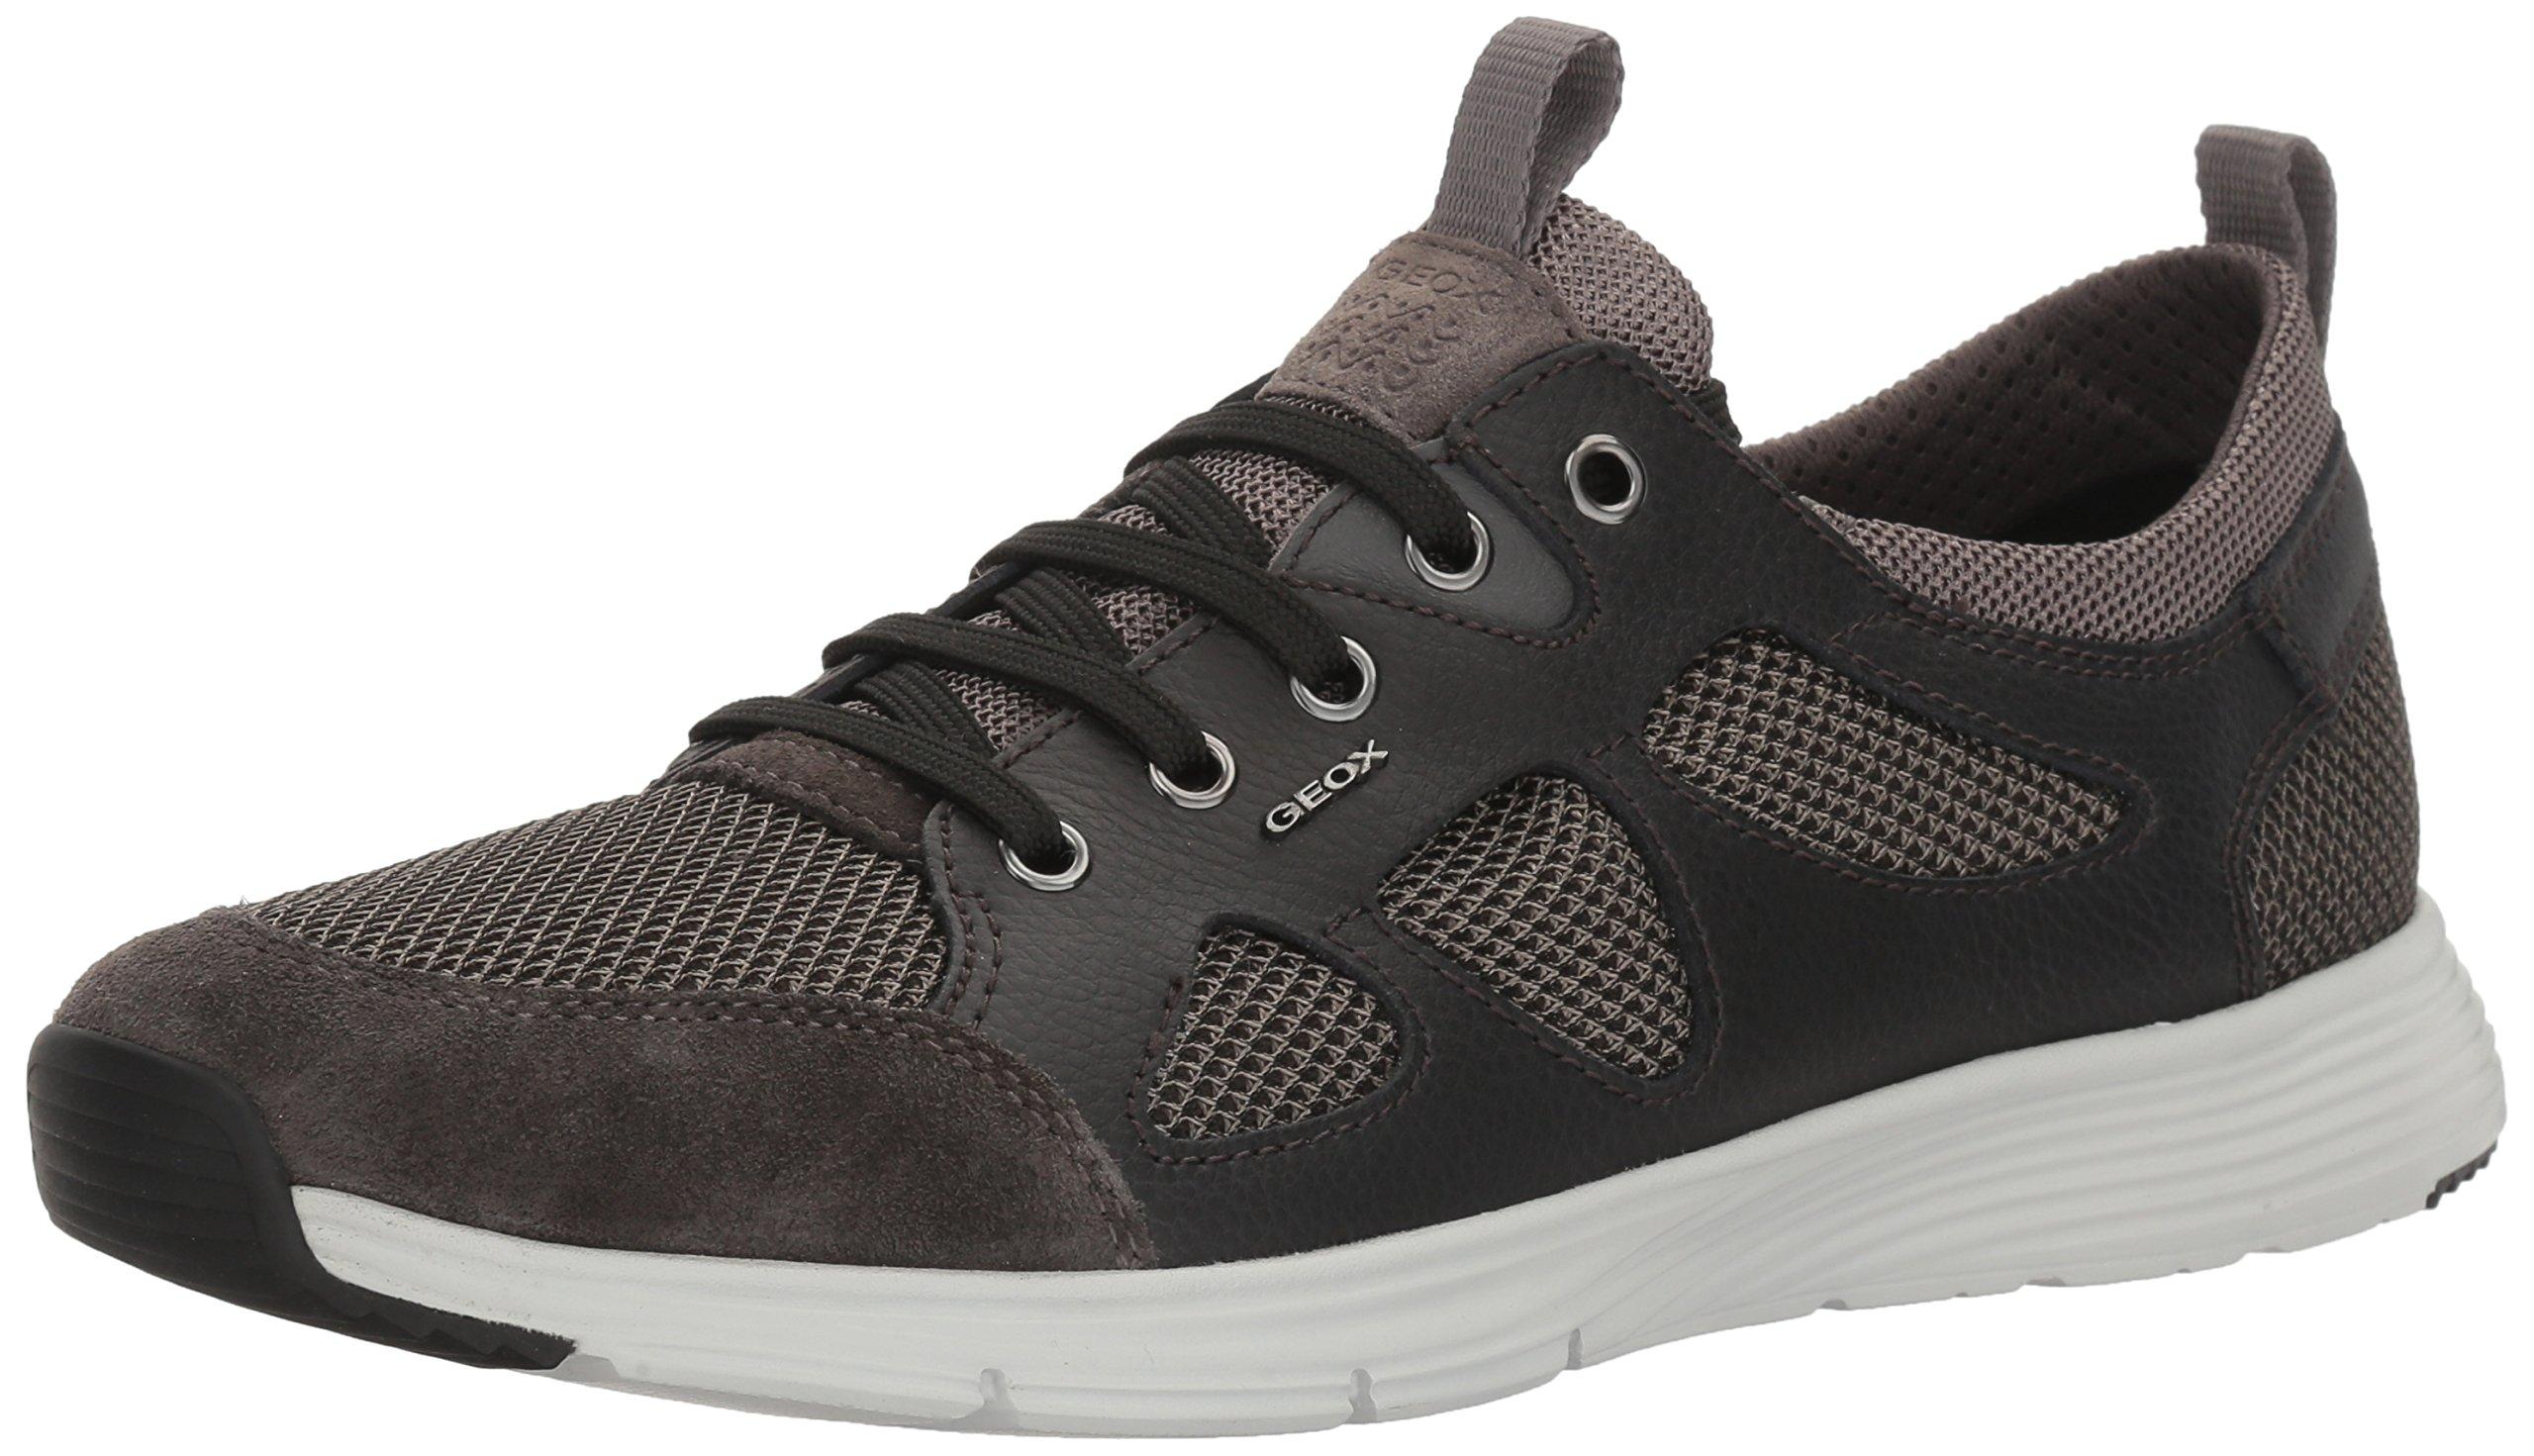 BSneakers Basses Snapish HommeNoiranthracite blackc921140 Geox U Eu dCoWrexB